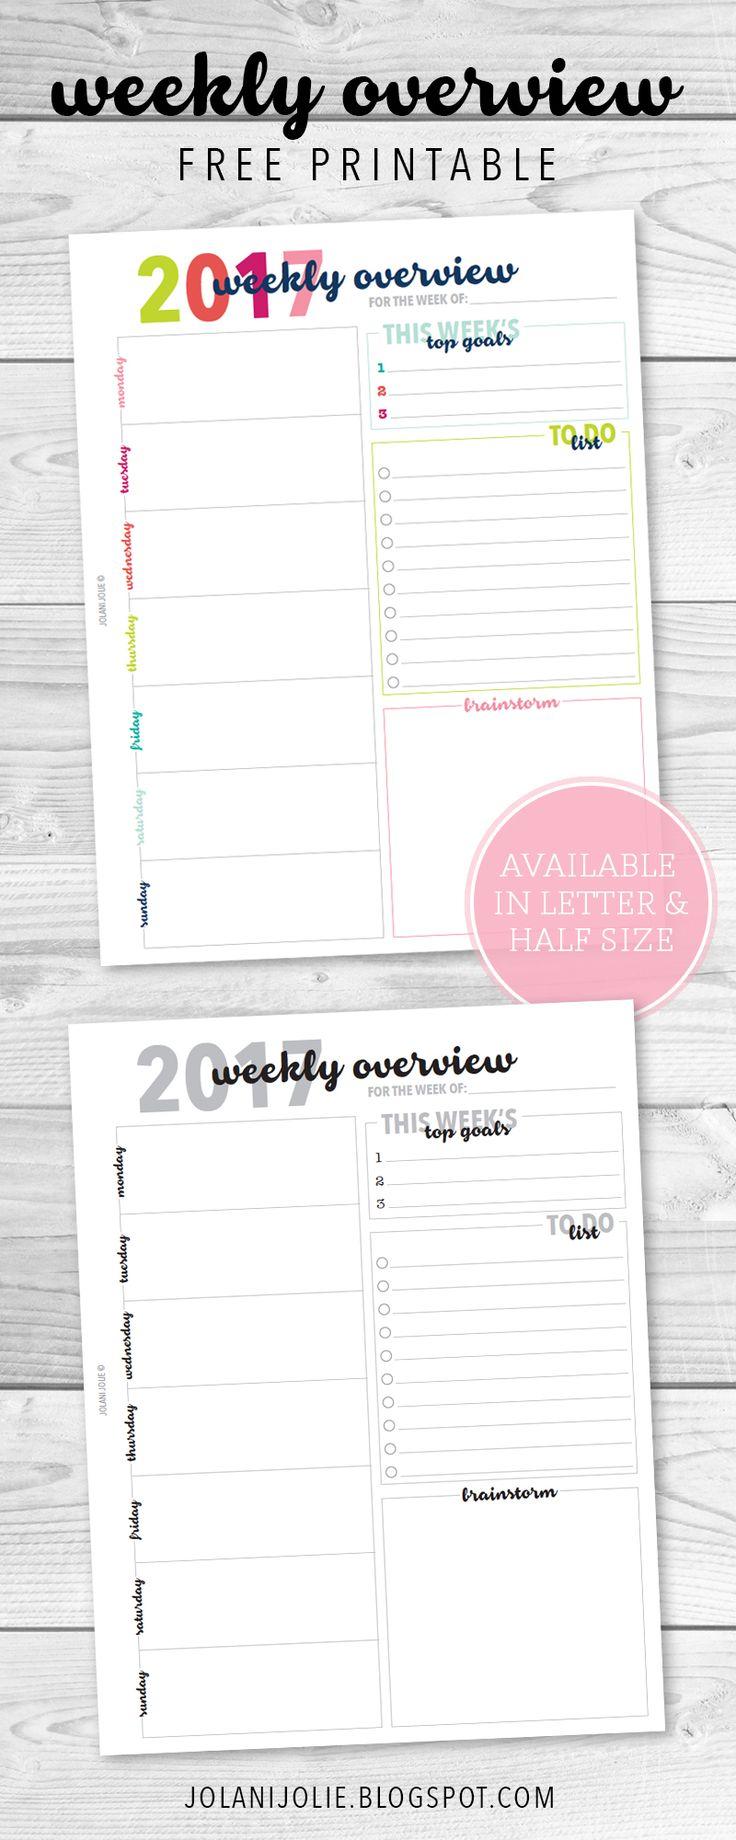 Pencil control worksheet for kids 187 tracing line worksheet for kids - Free Weekly Planner Printable